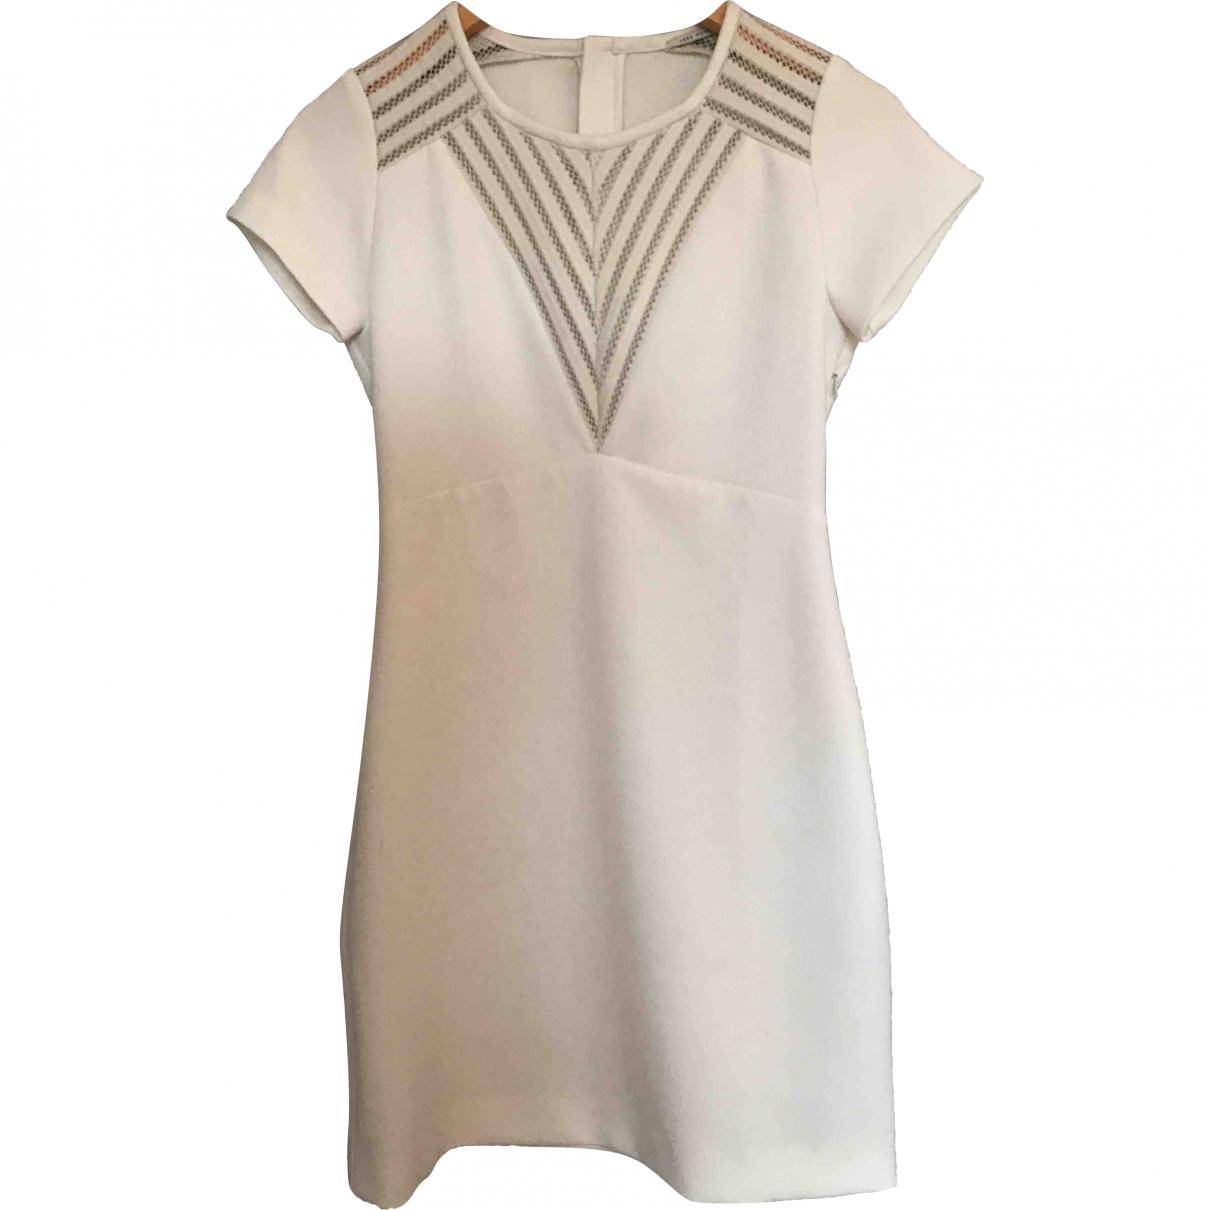 Ikks \N Ecru dress for Women XS International